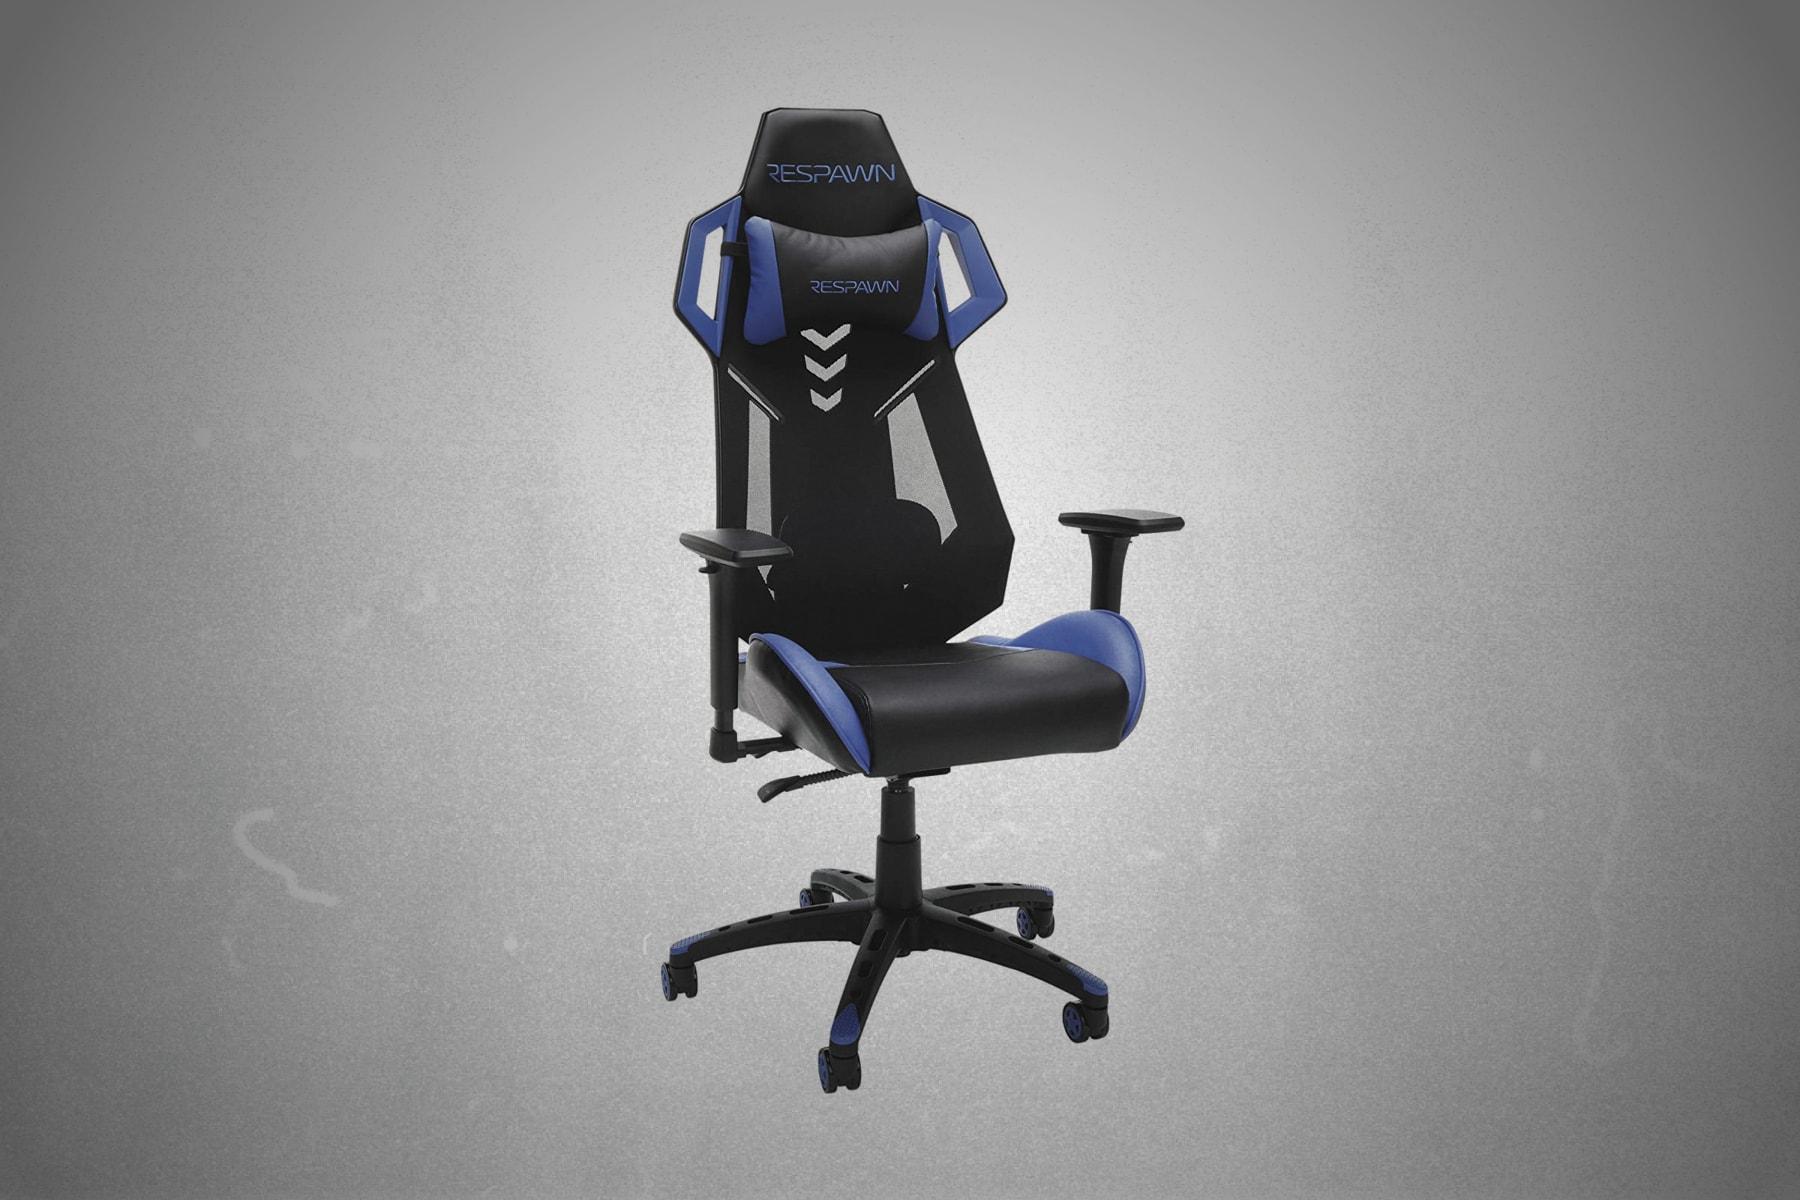 best cheap gaming chair